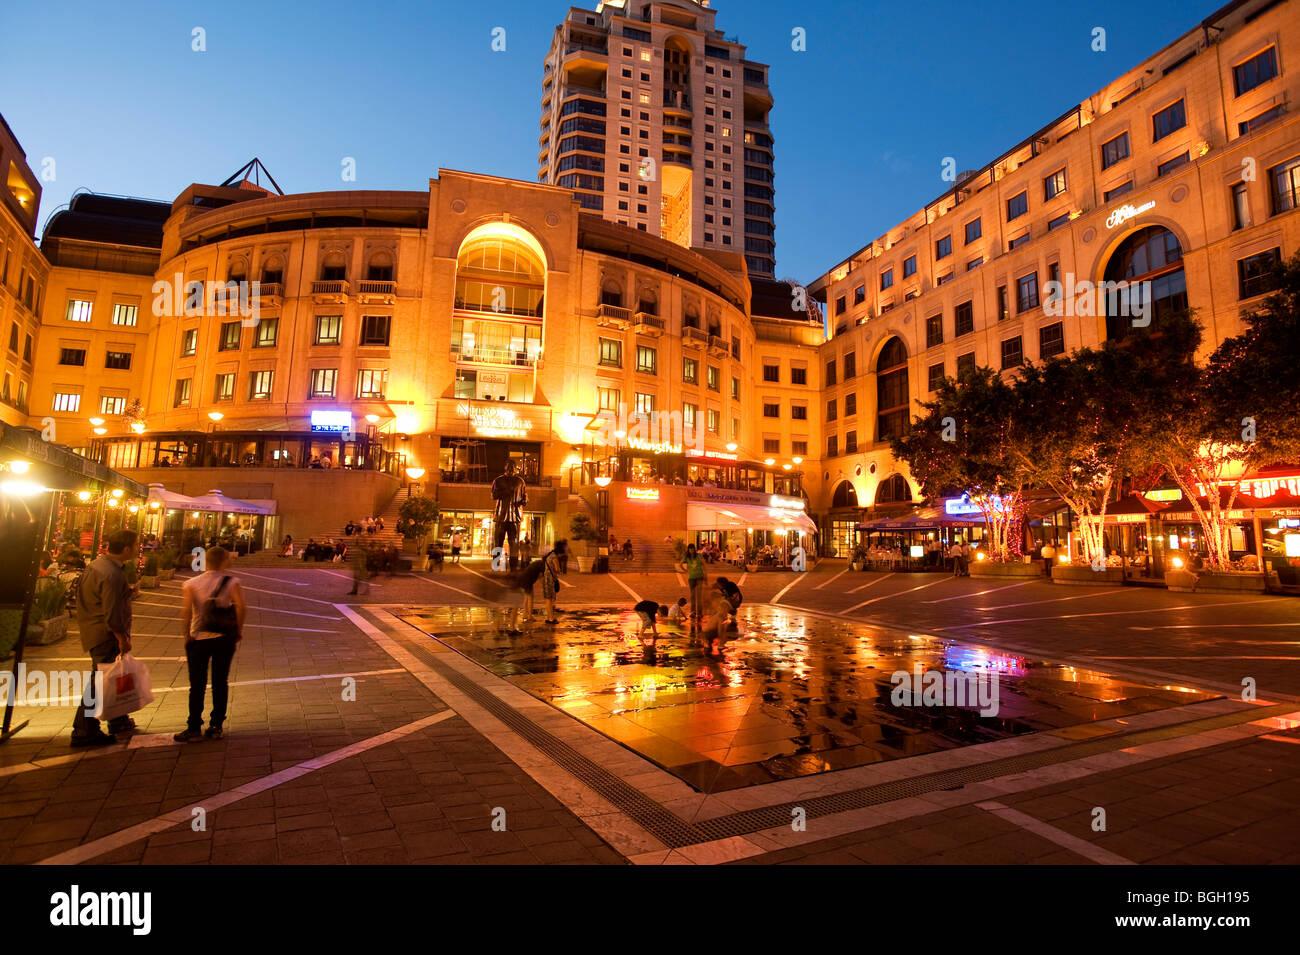 Nelson Mandela Square in serata. Sandton Johannesburg, Sud Africa Immagini Stock